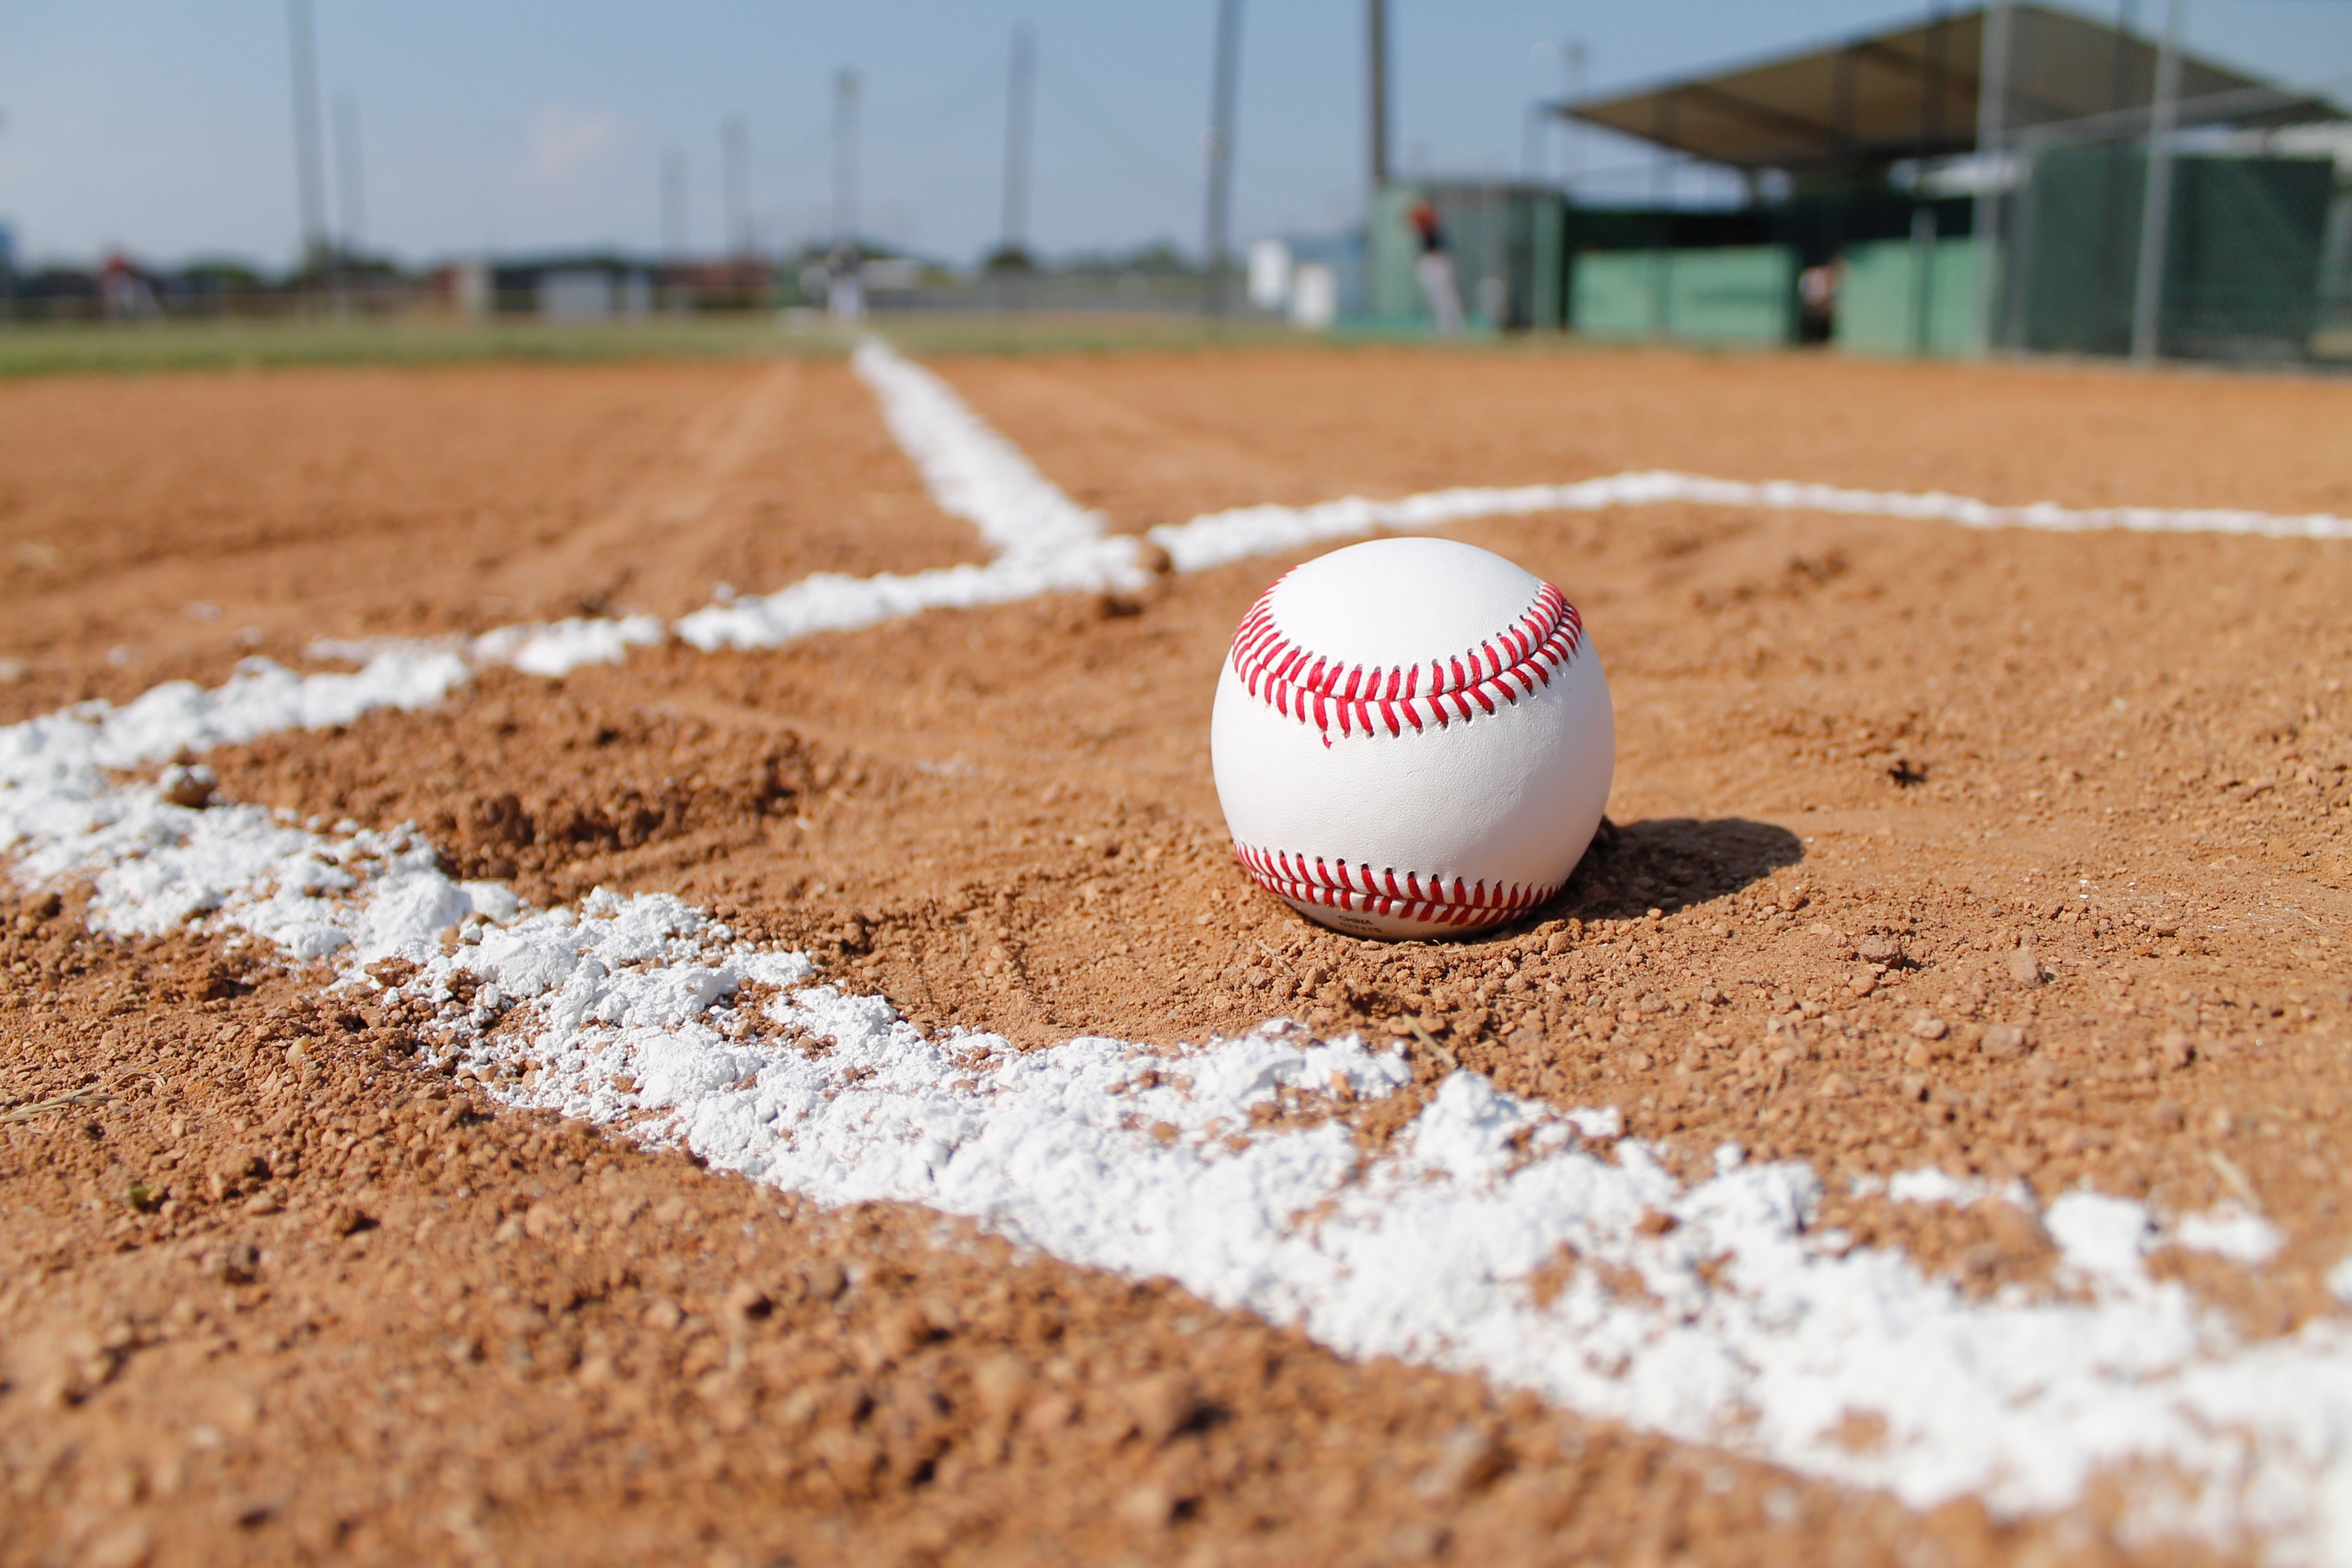 beisebol-bola-campo